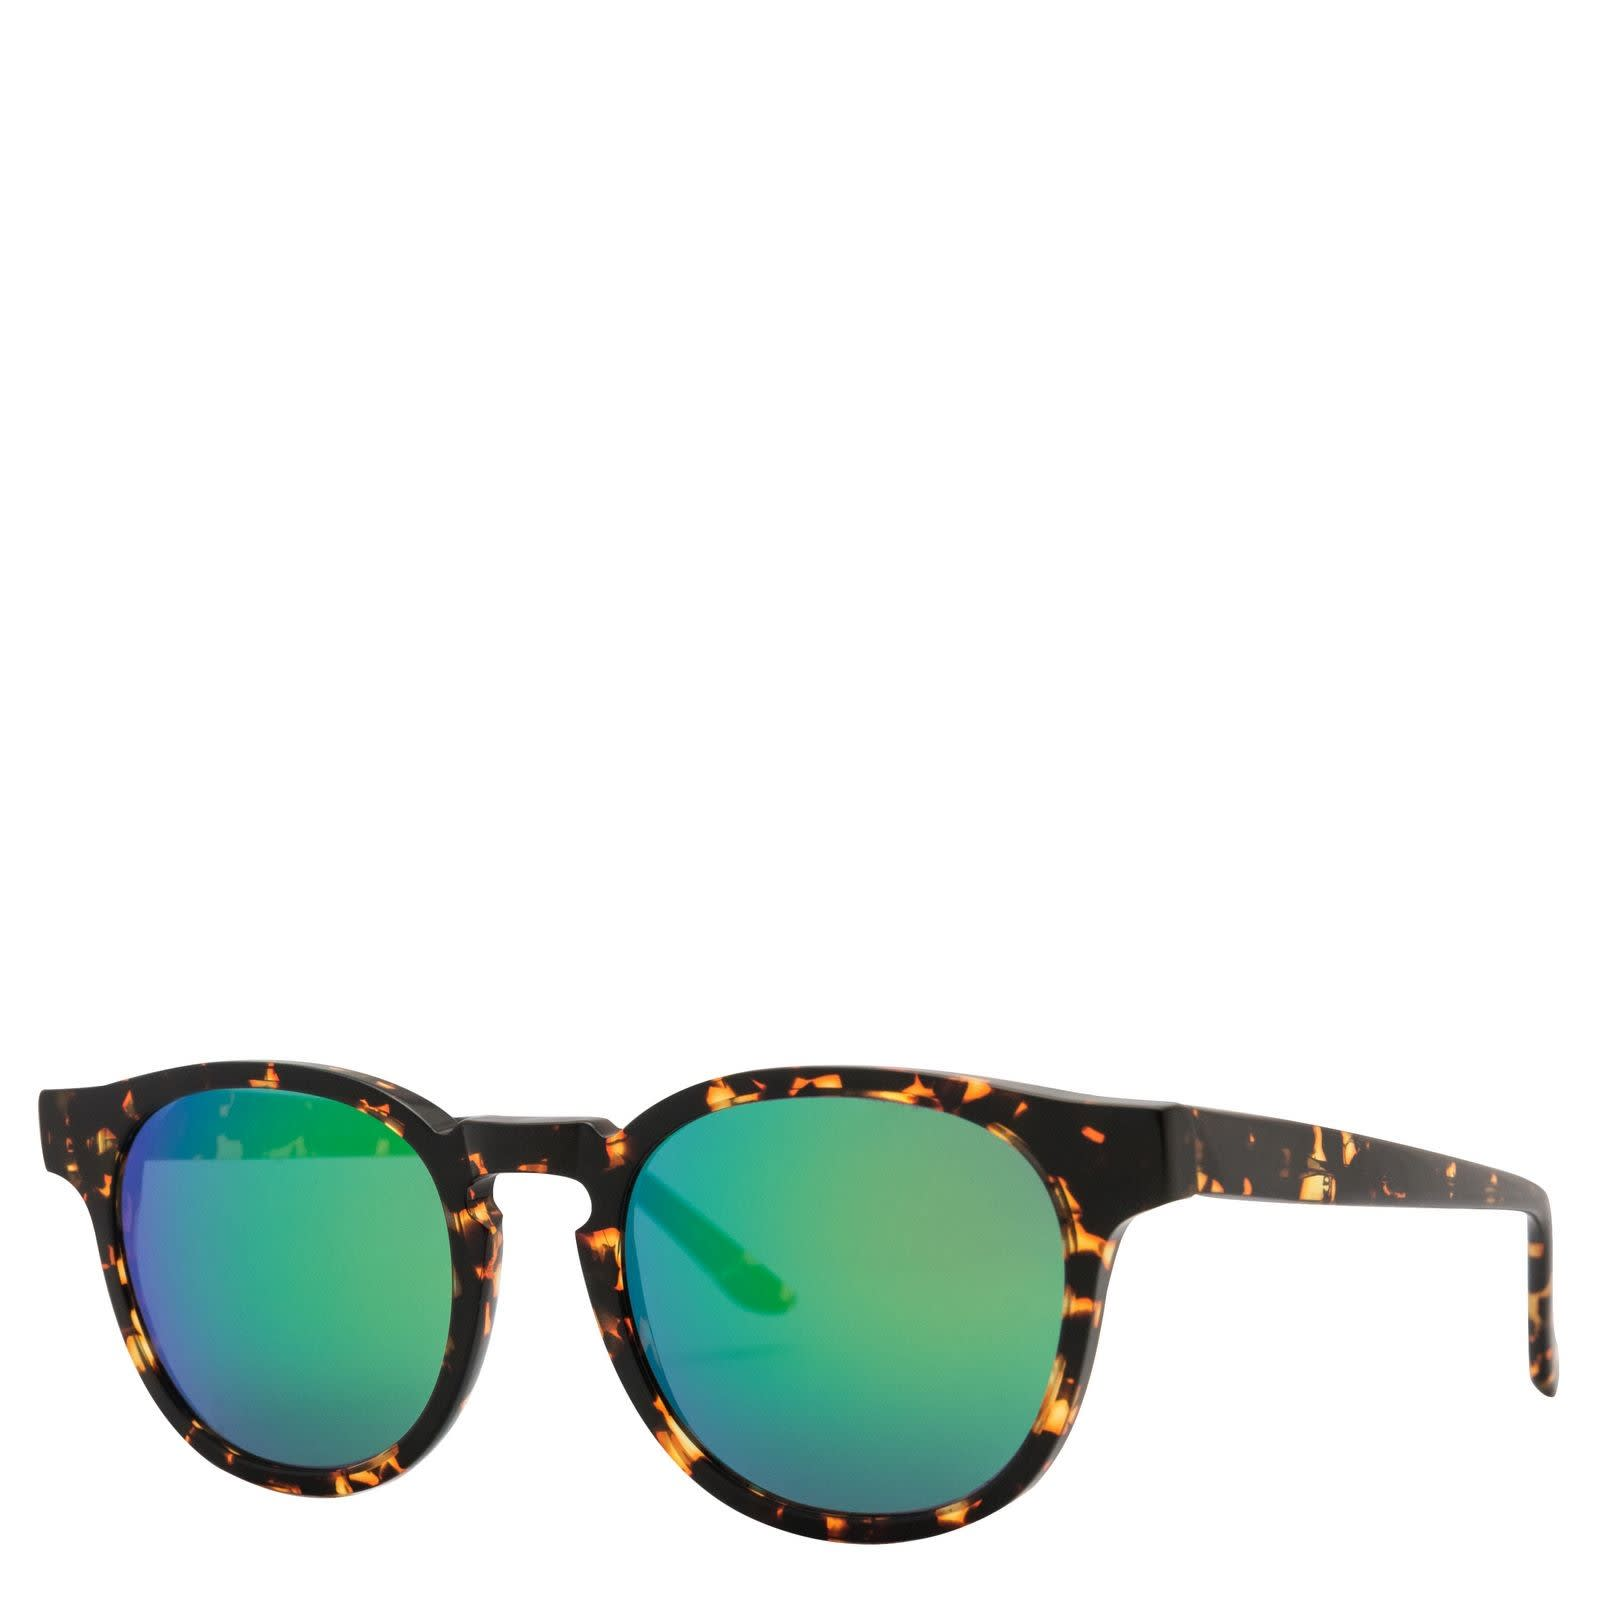 Tortoise Joe Sunglasses For Kid